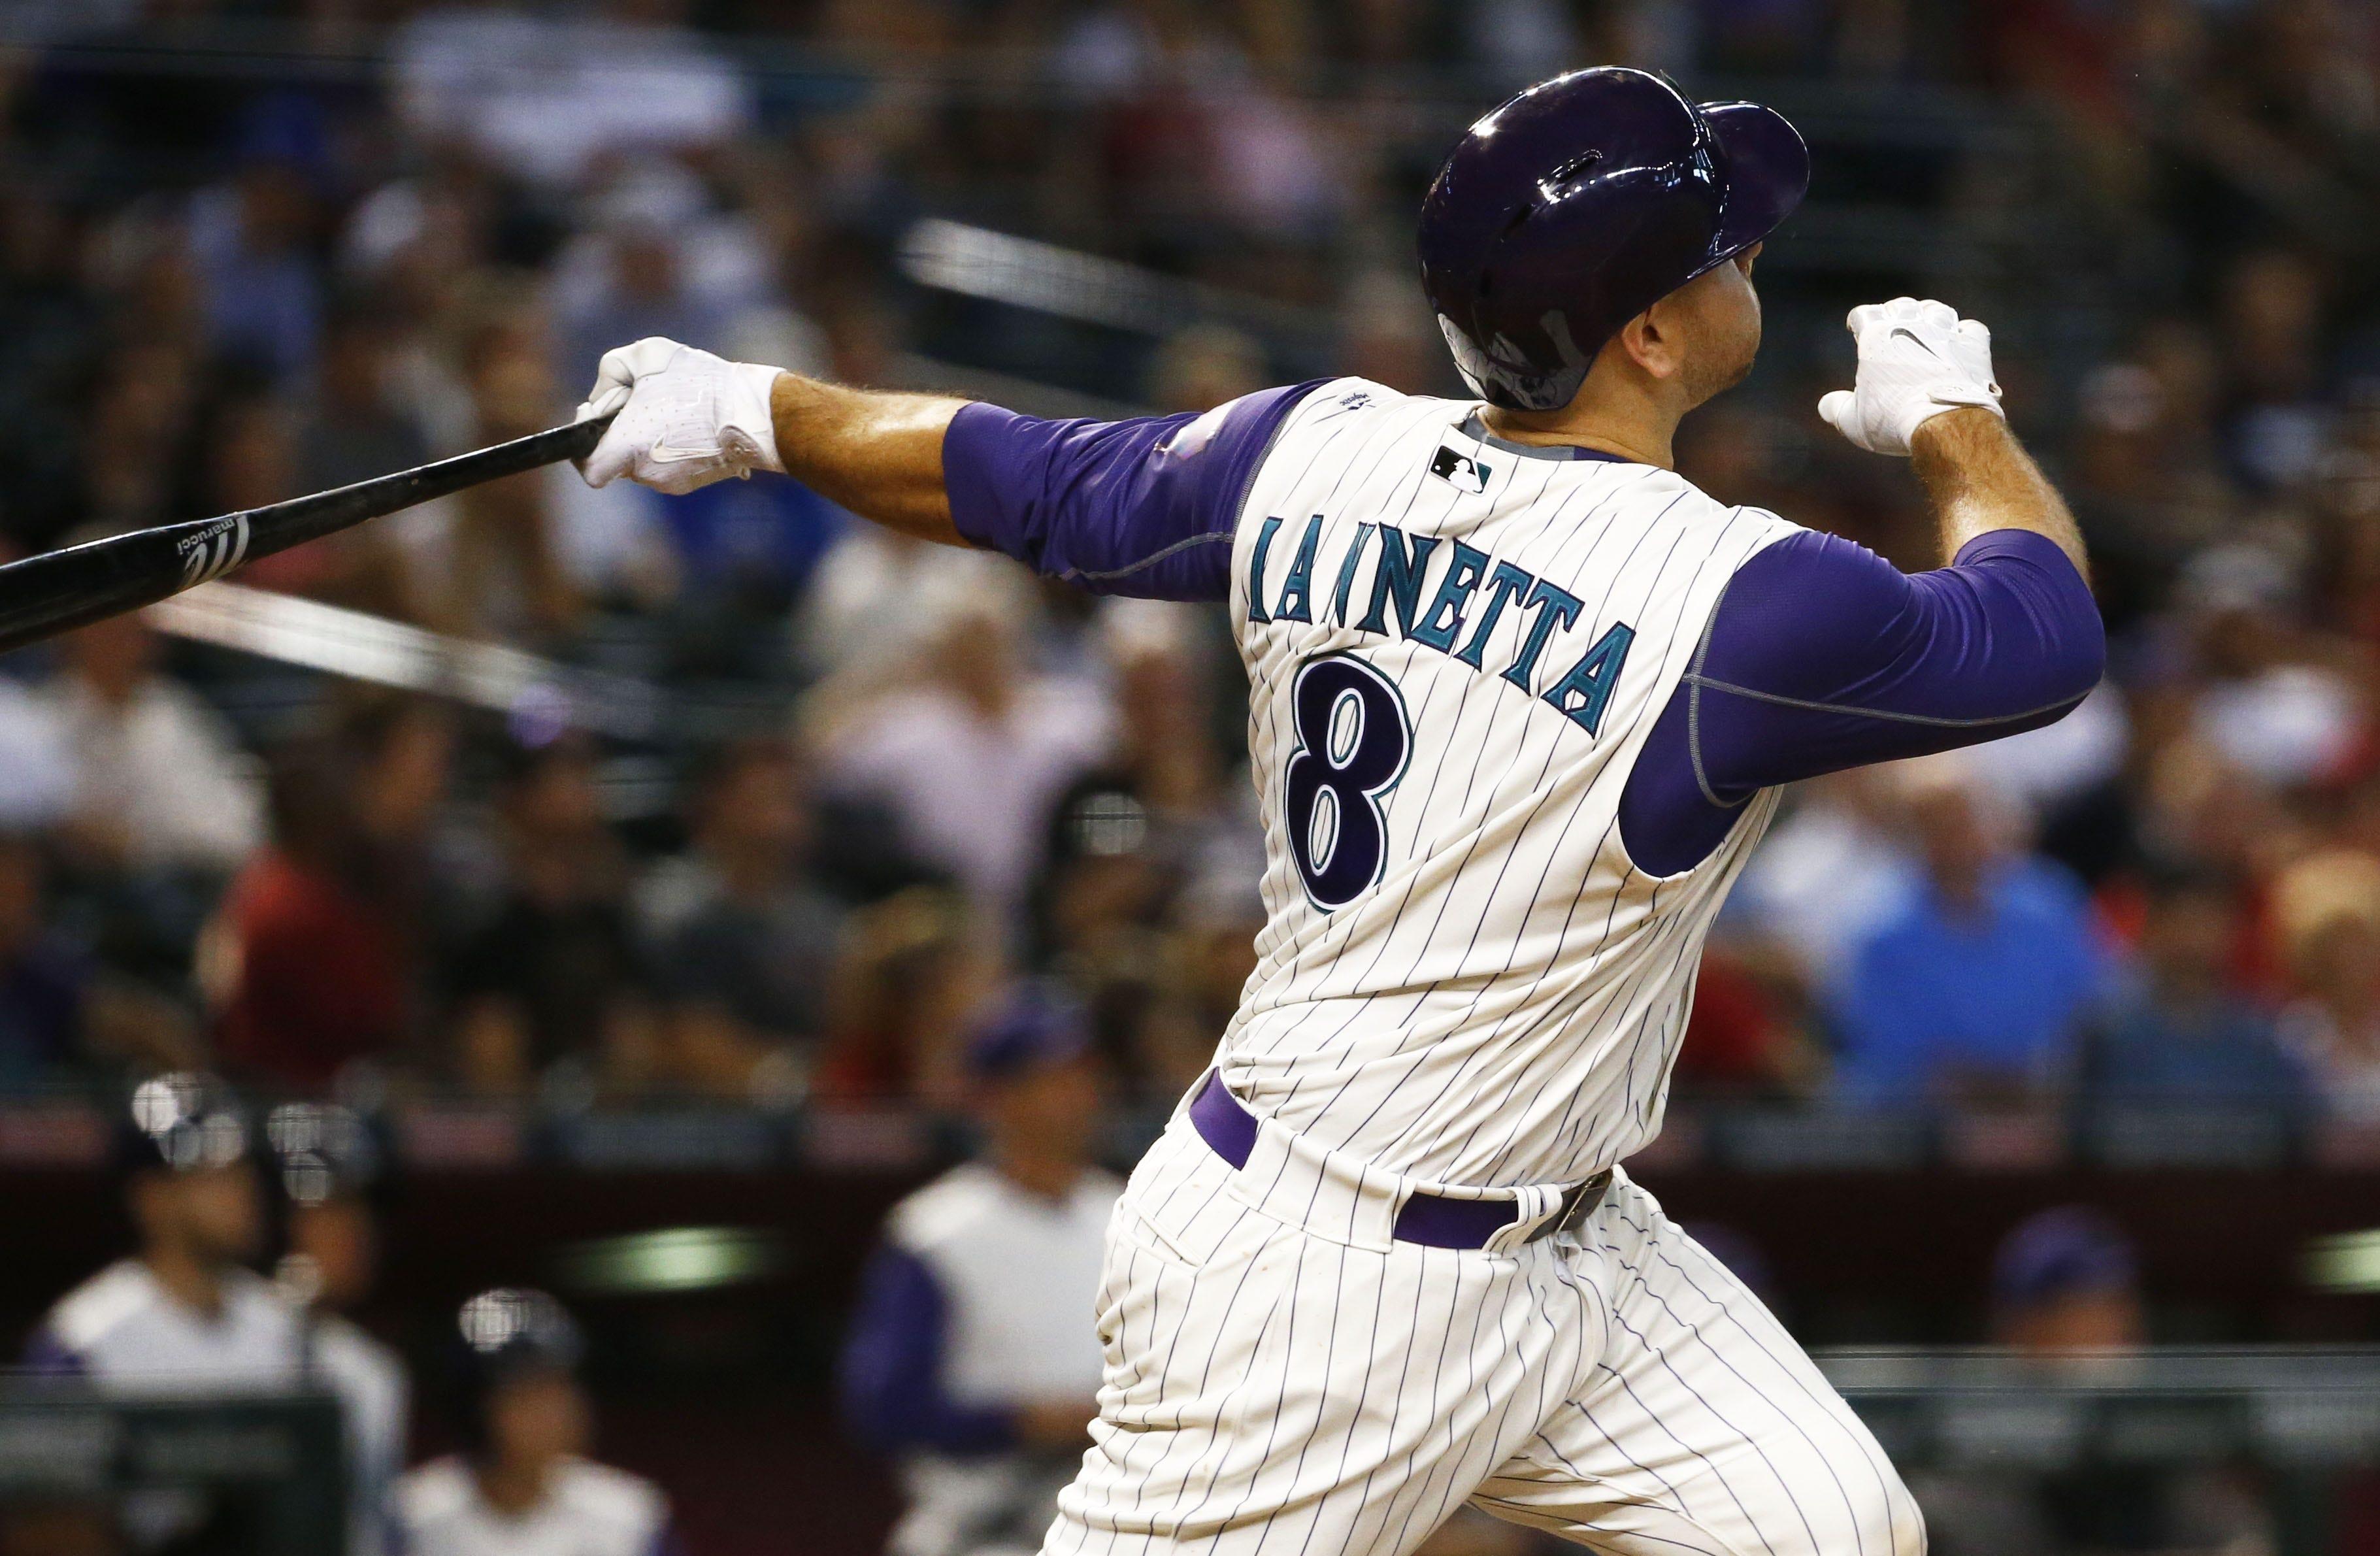 Game day: Iannetta blast puts Diamondbacks on top vs. Padres